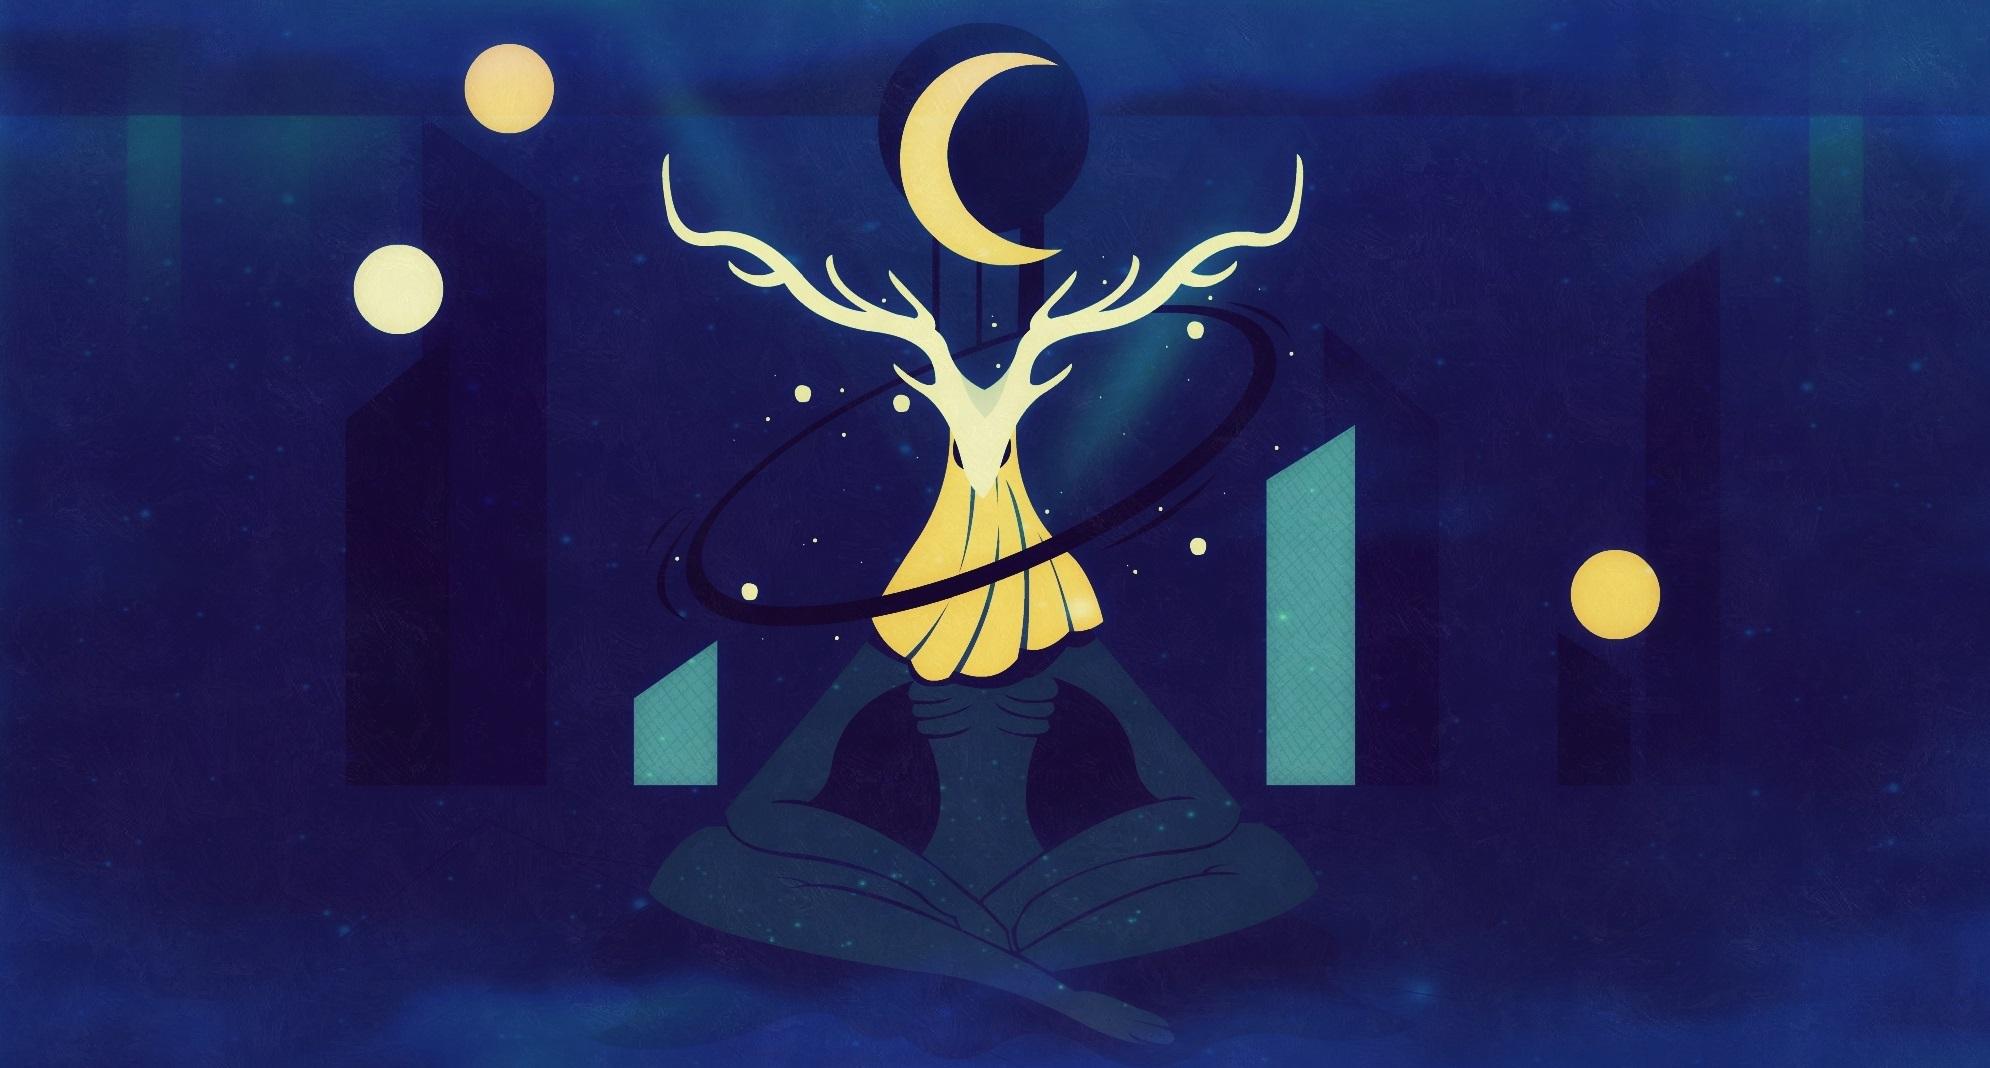 The dark branch of the mind's night